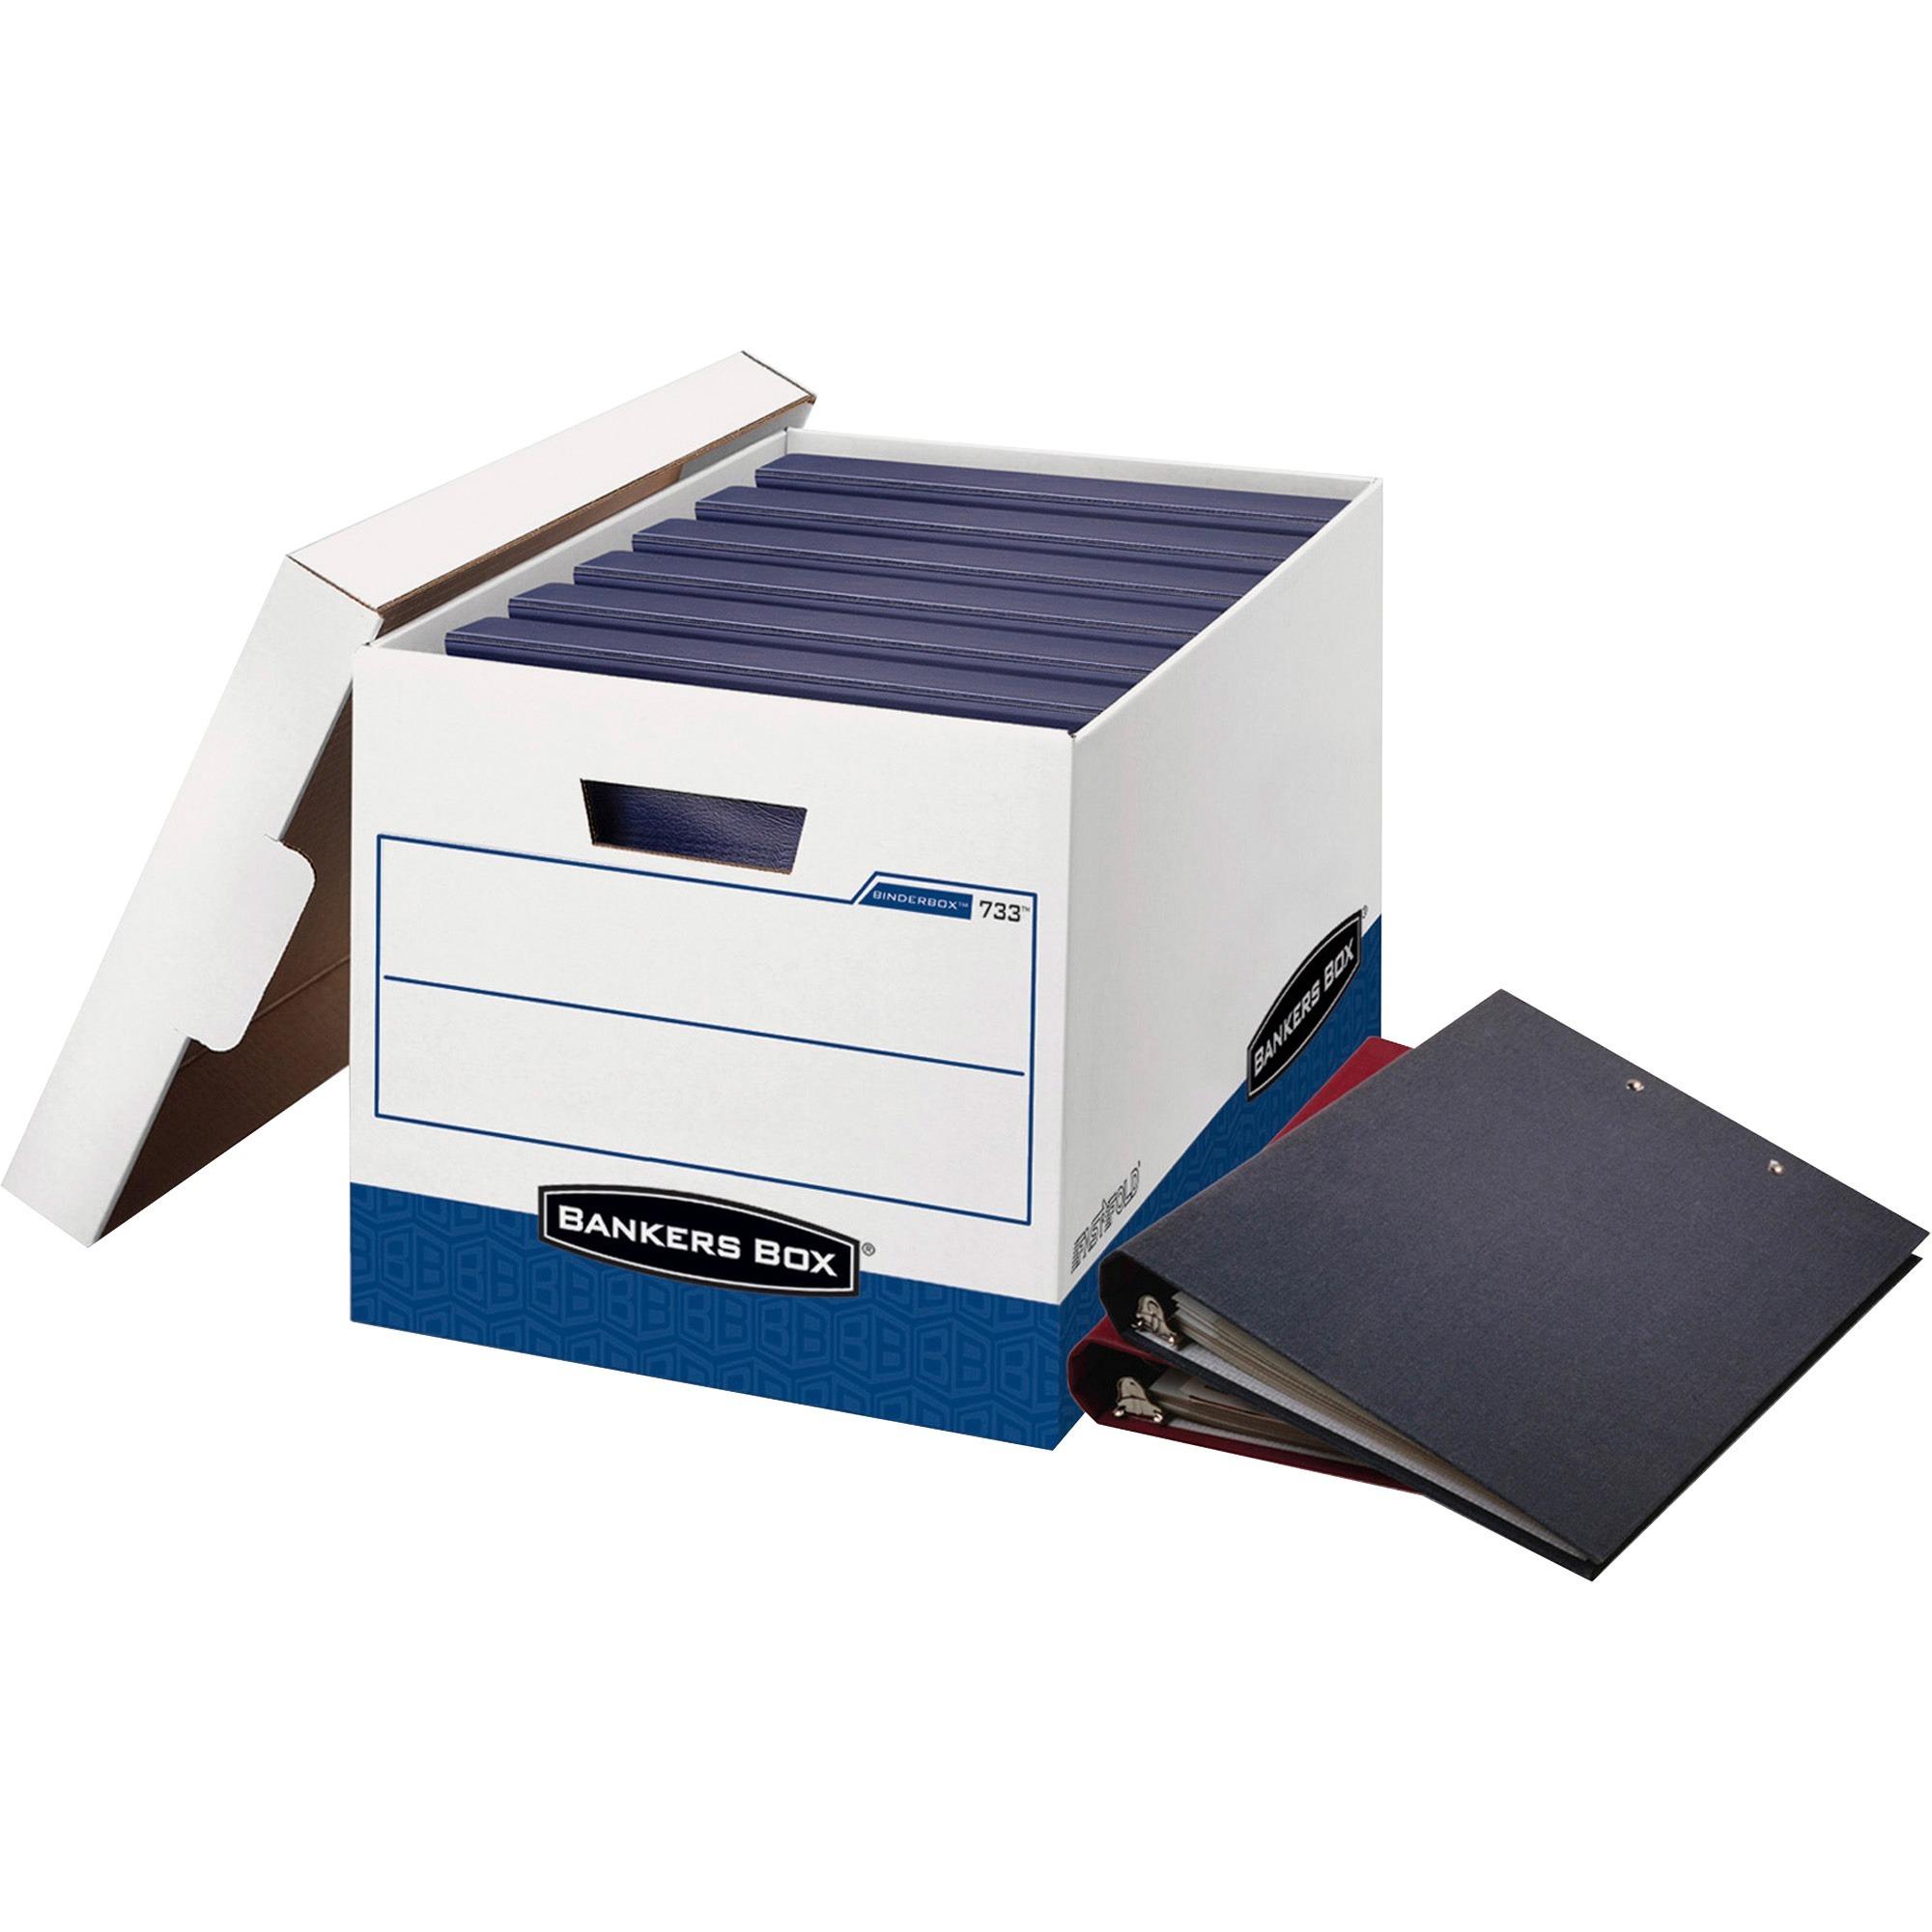 Bankers Box Binder Storage Box